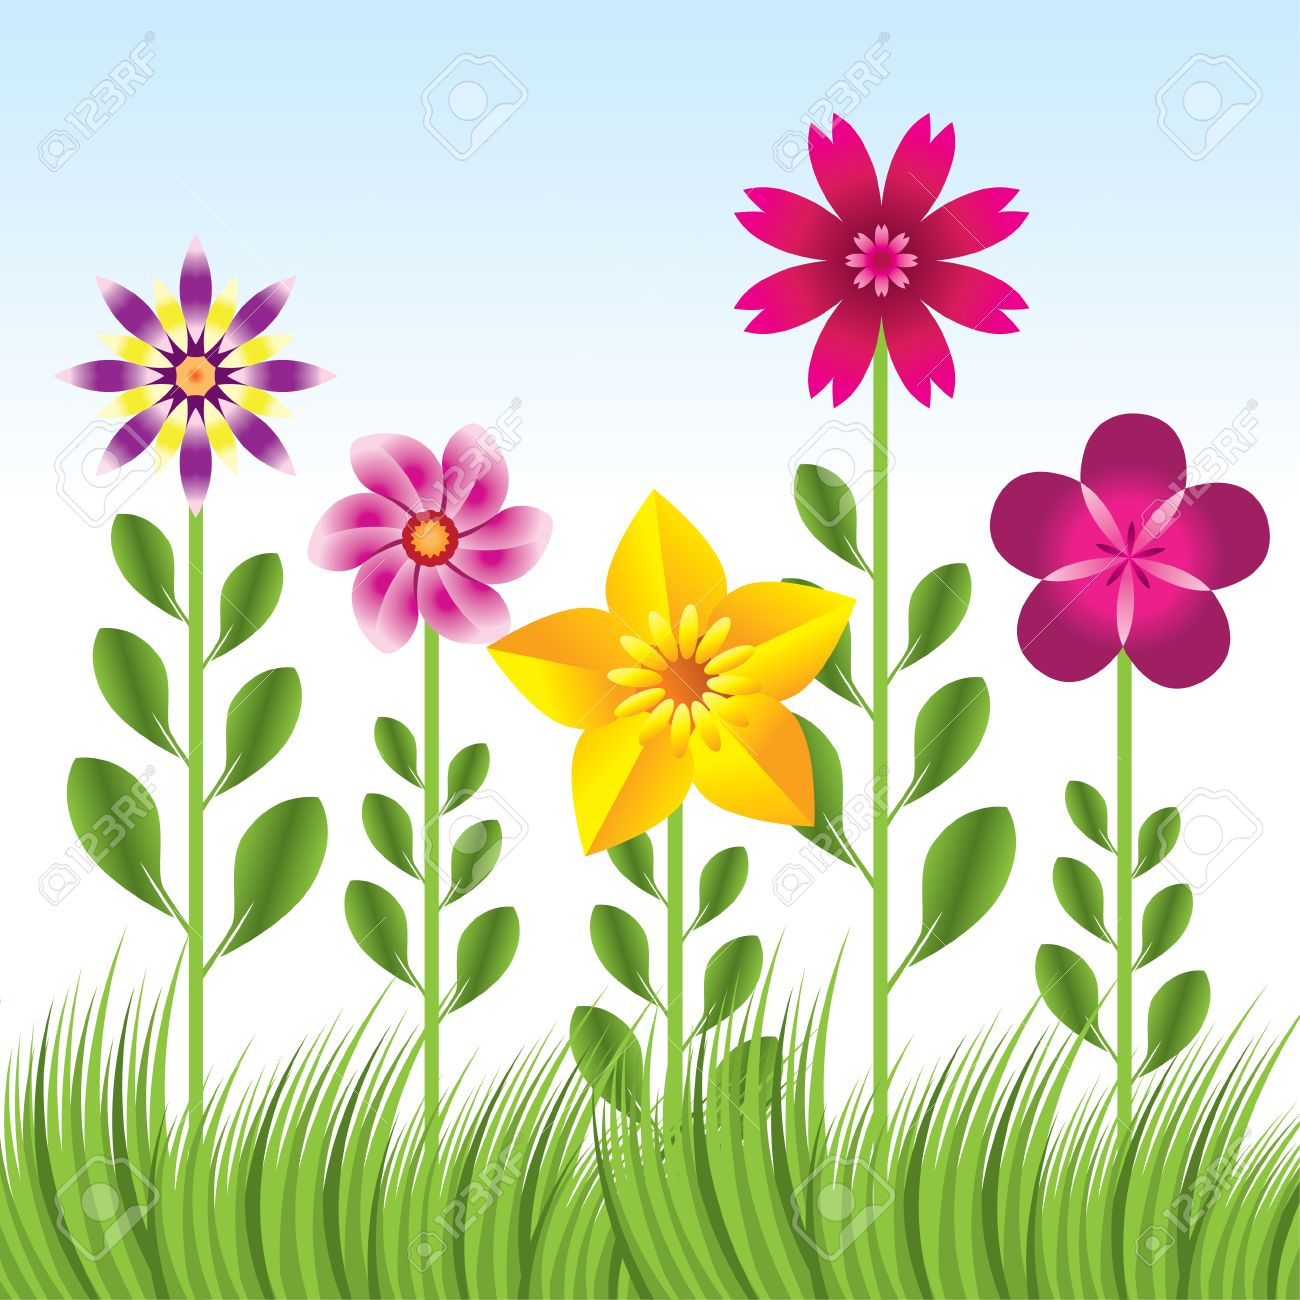 Flower garden cartoon - Abstract Flower Background With Grass Stock Vector 8033129